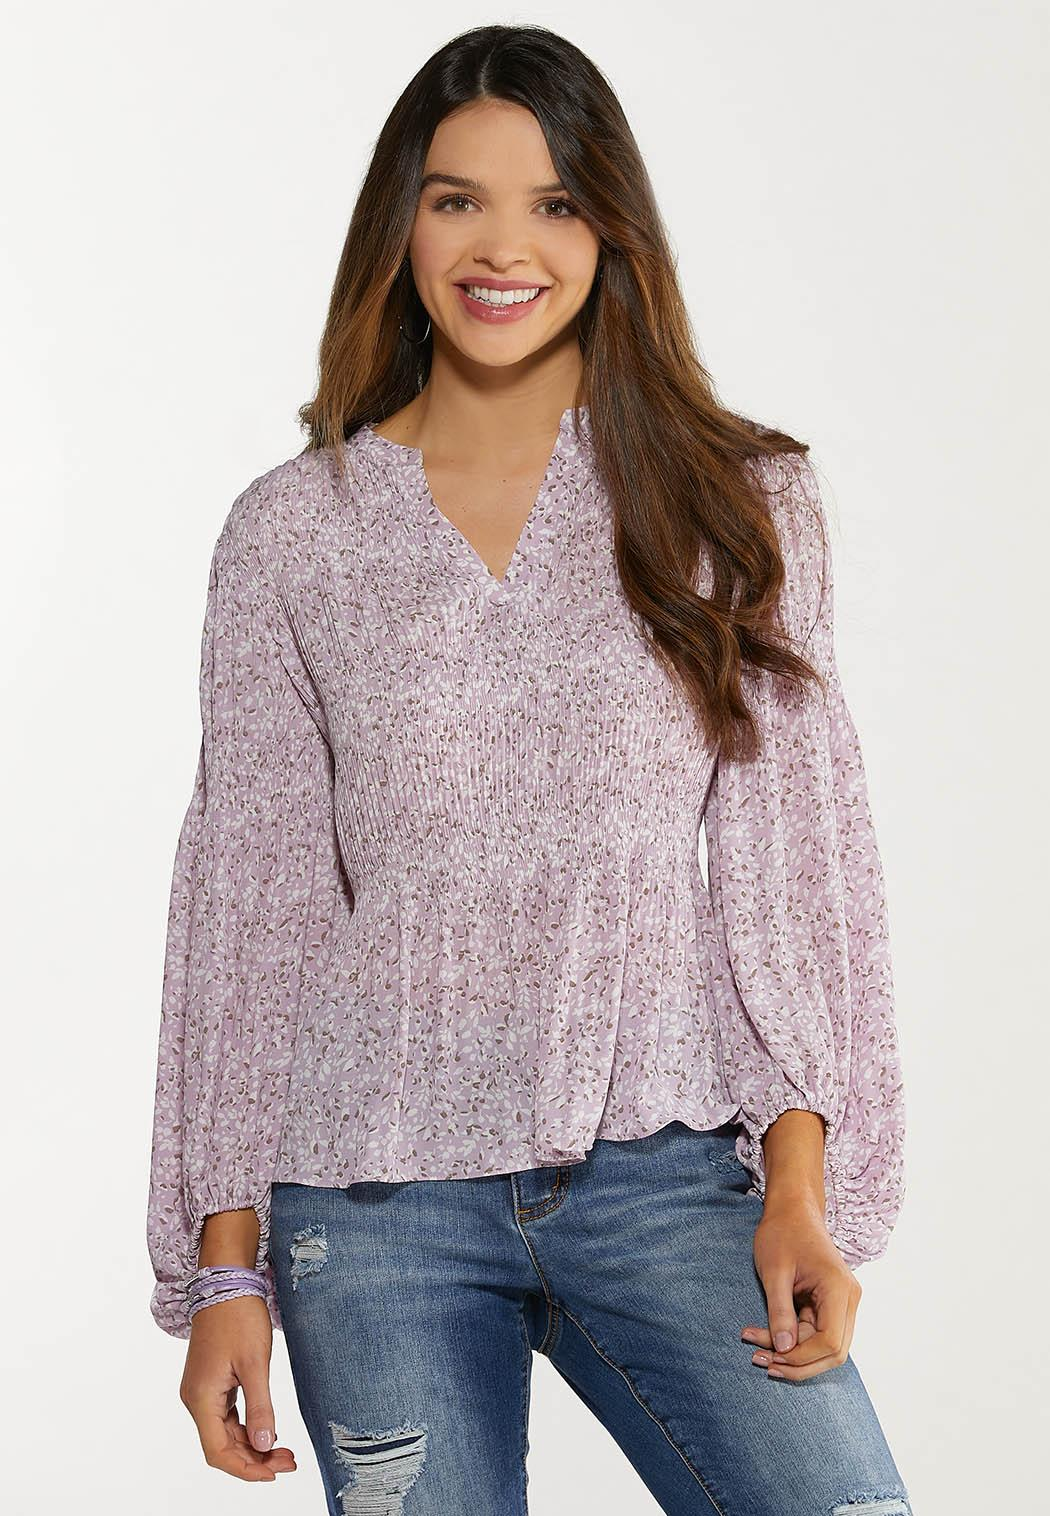 Lavender Fields Sleeve Top